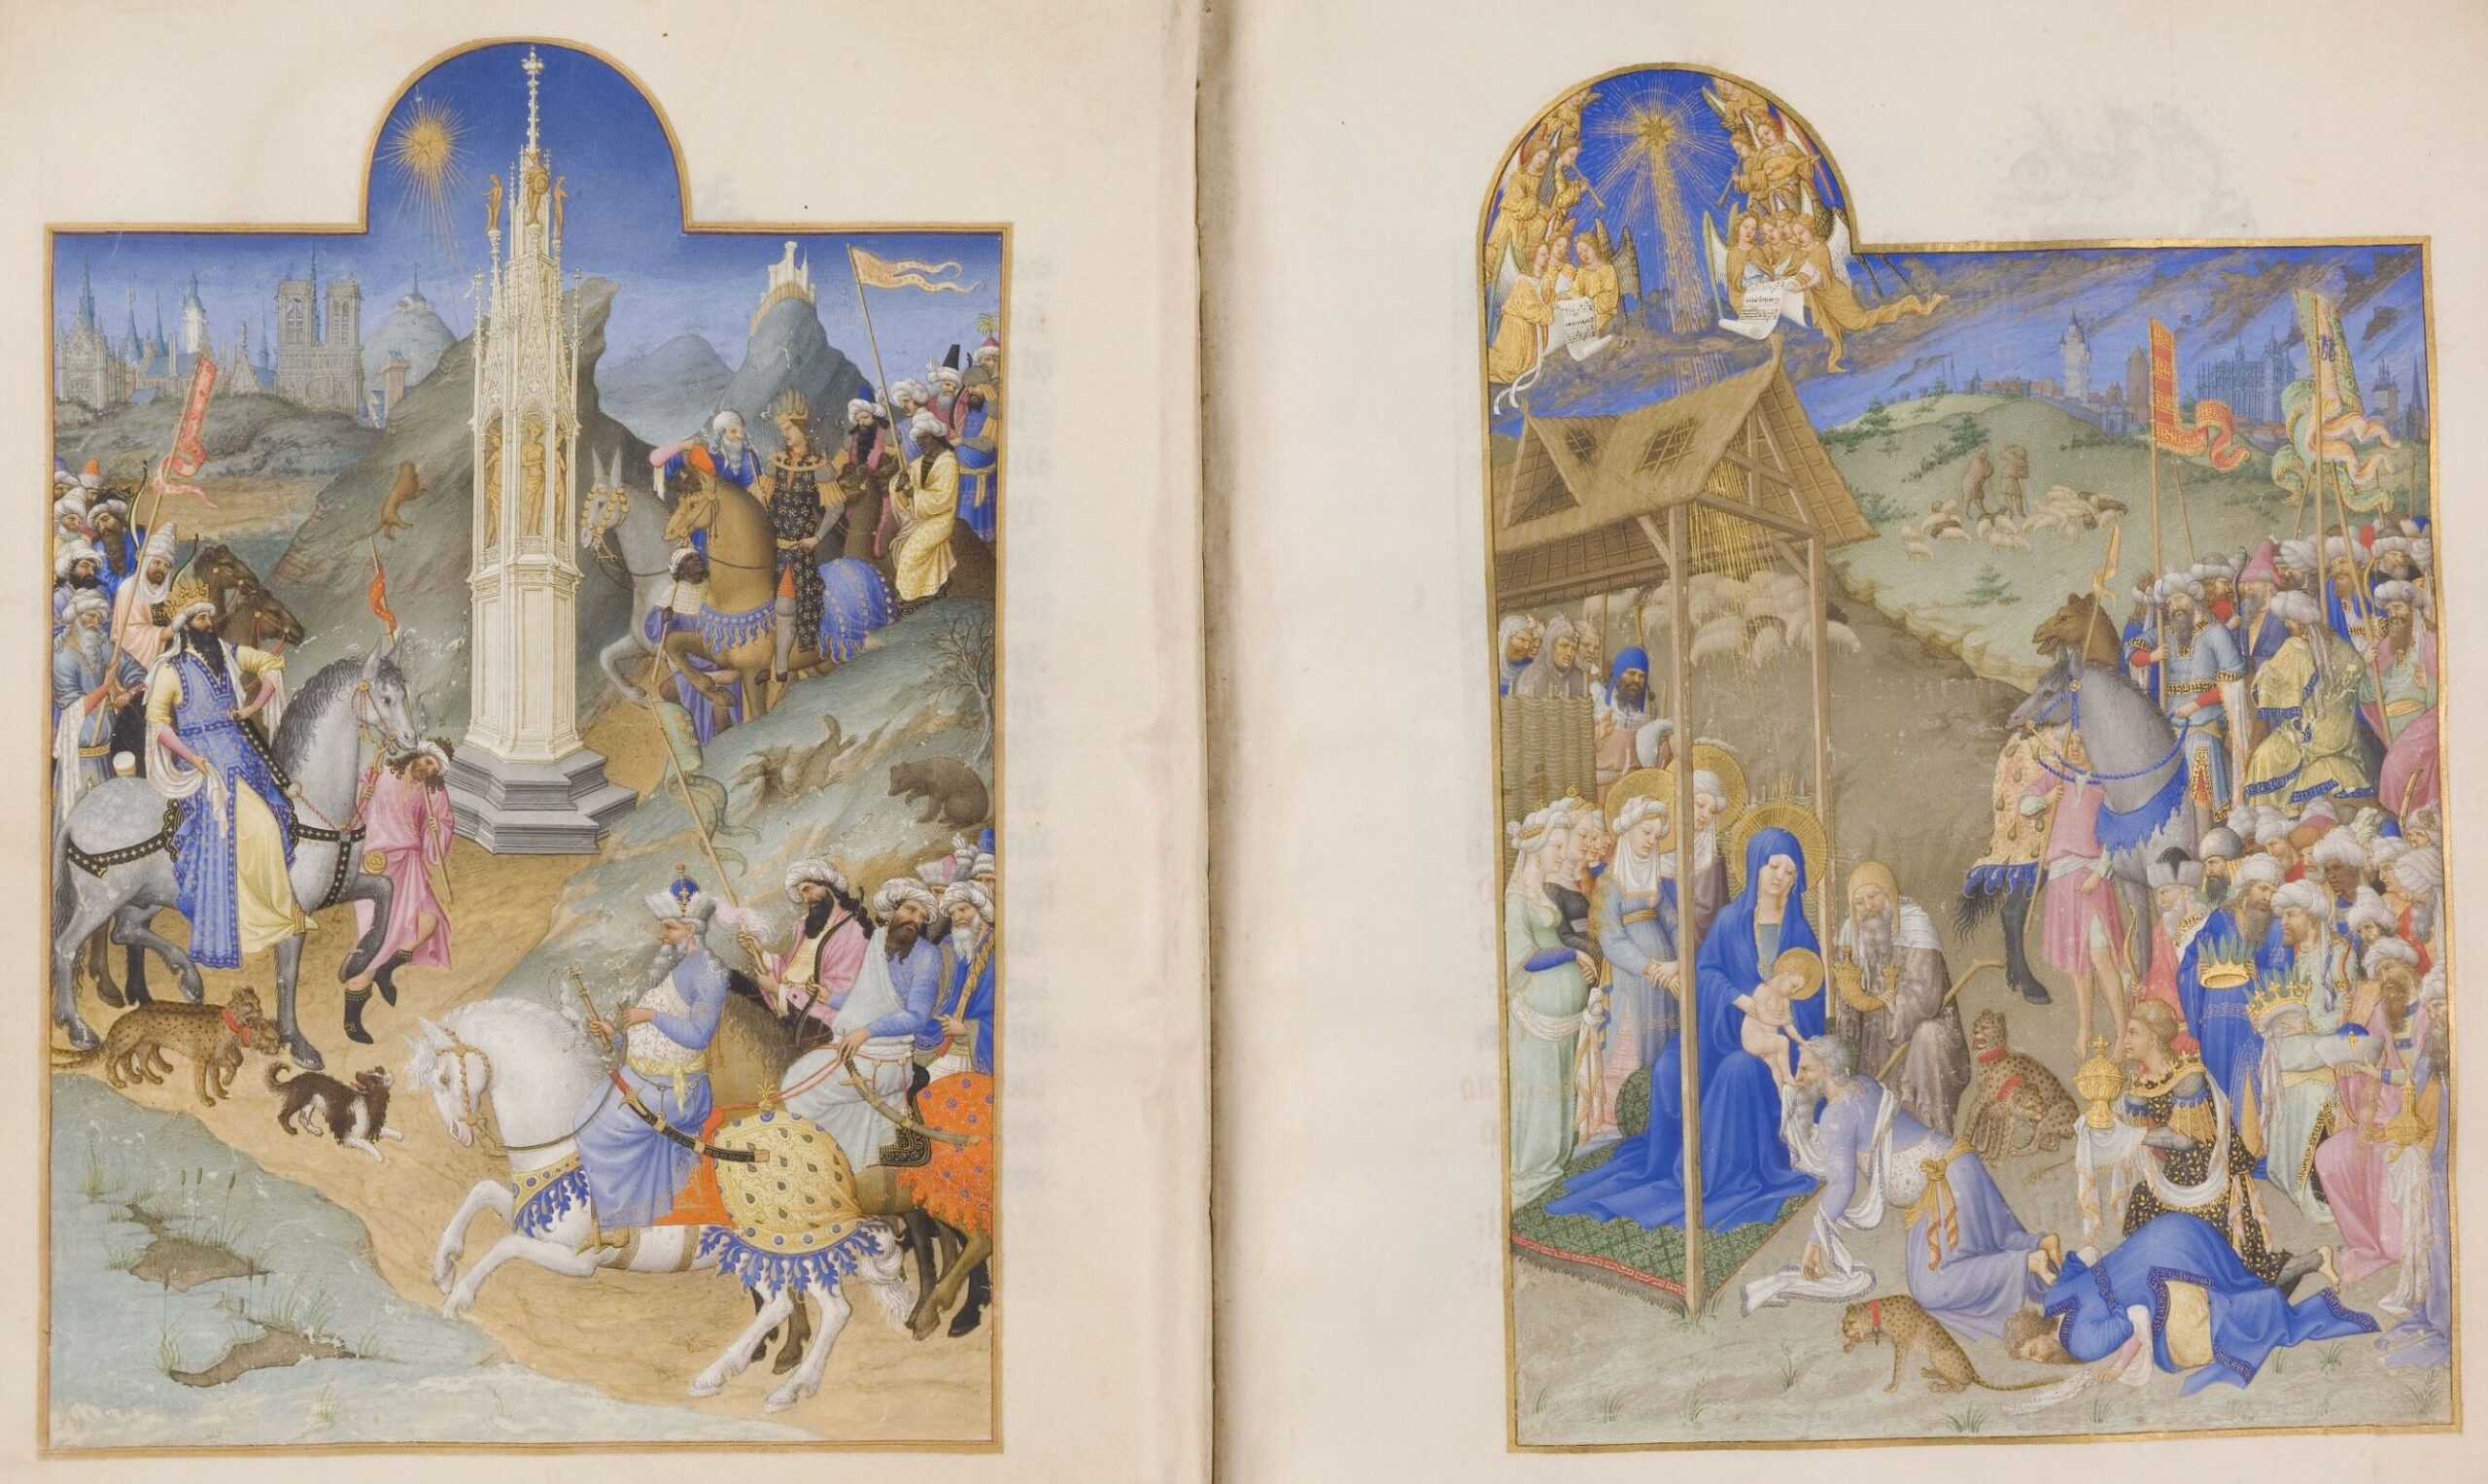 Les_Tres_Riches_Heures_du_duc_de_Berry Musee Conde Chantilly MS 65 fol 51v-52 Limbourg 1411-16